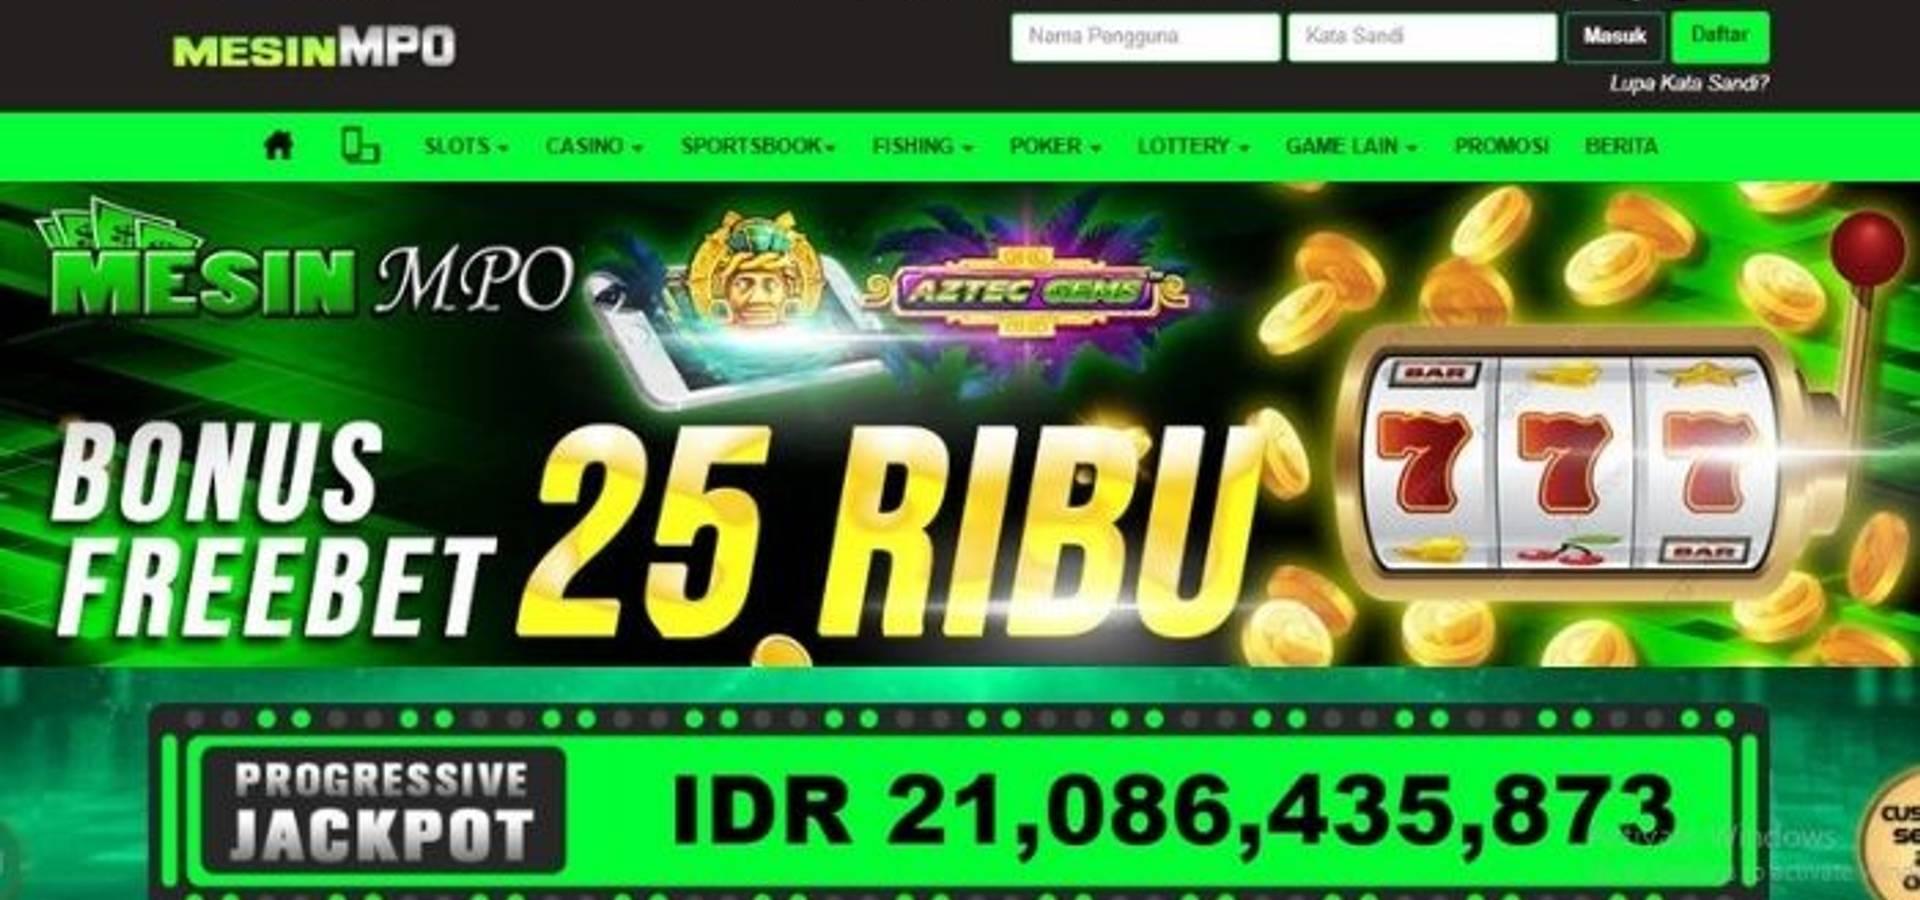 Agen Judi Slot Pragmatic Play Terpercaya Indonesia Mesinmpo Homify